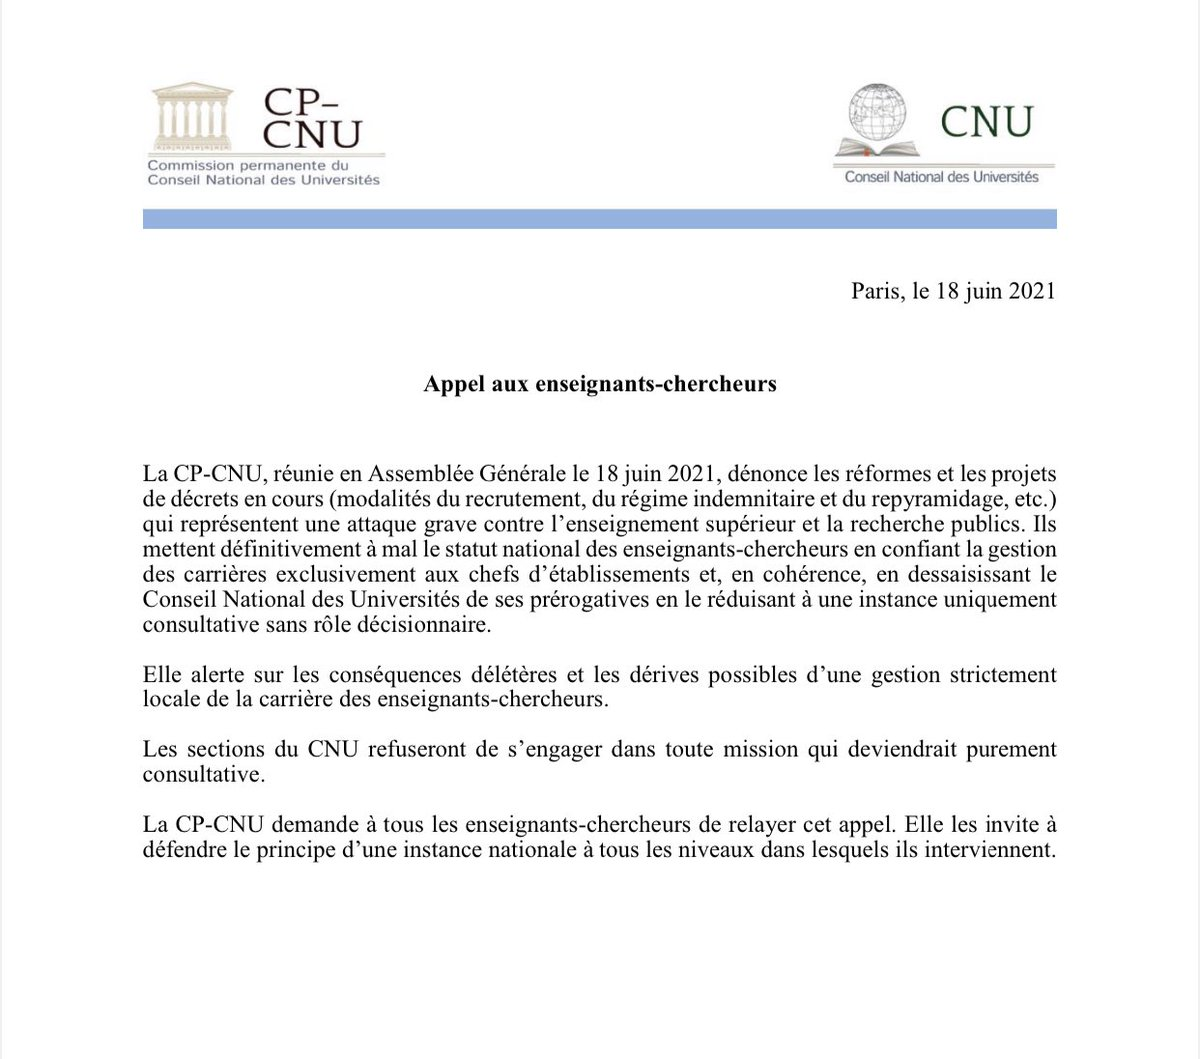 RT @ArnaudMartinon: 👉 CNU appel aux enseignants-chercheurs https://t.co/YUYOInIAiI